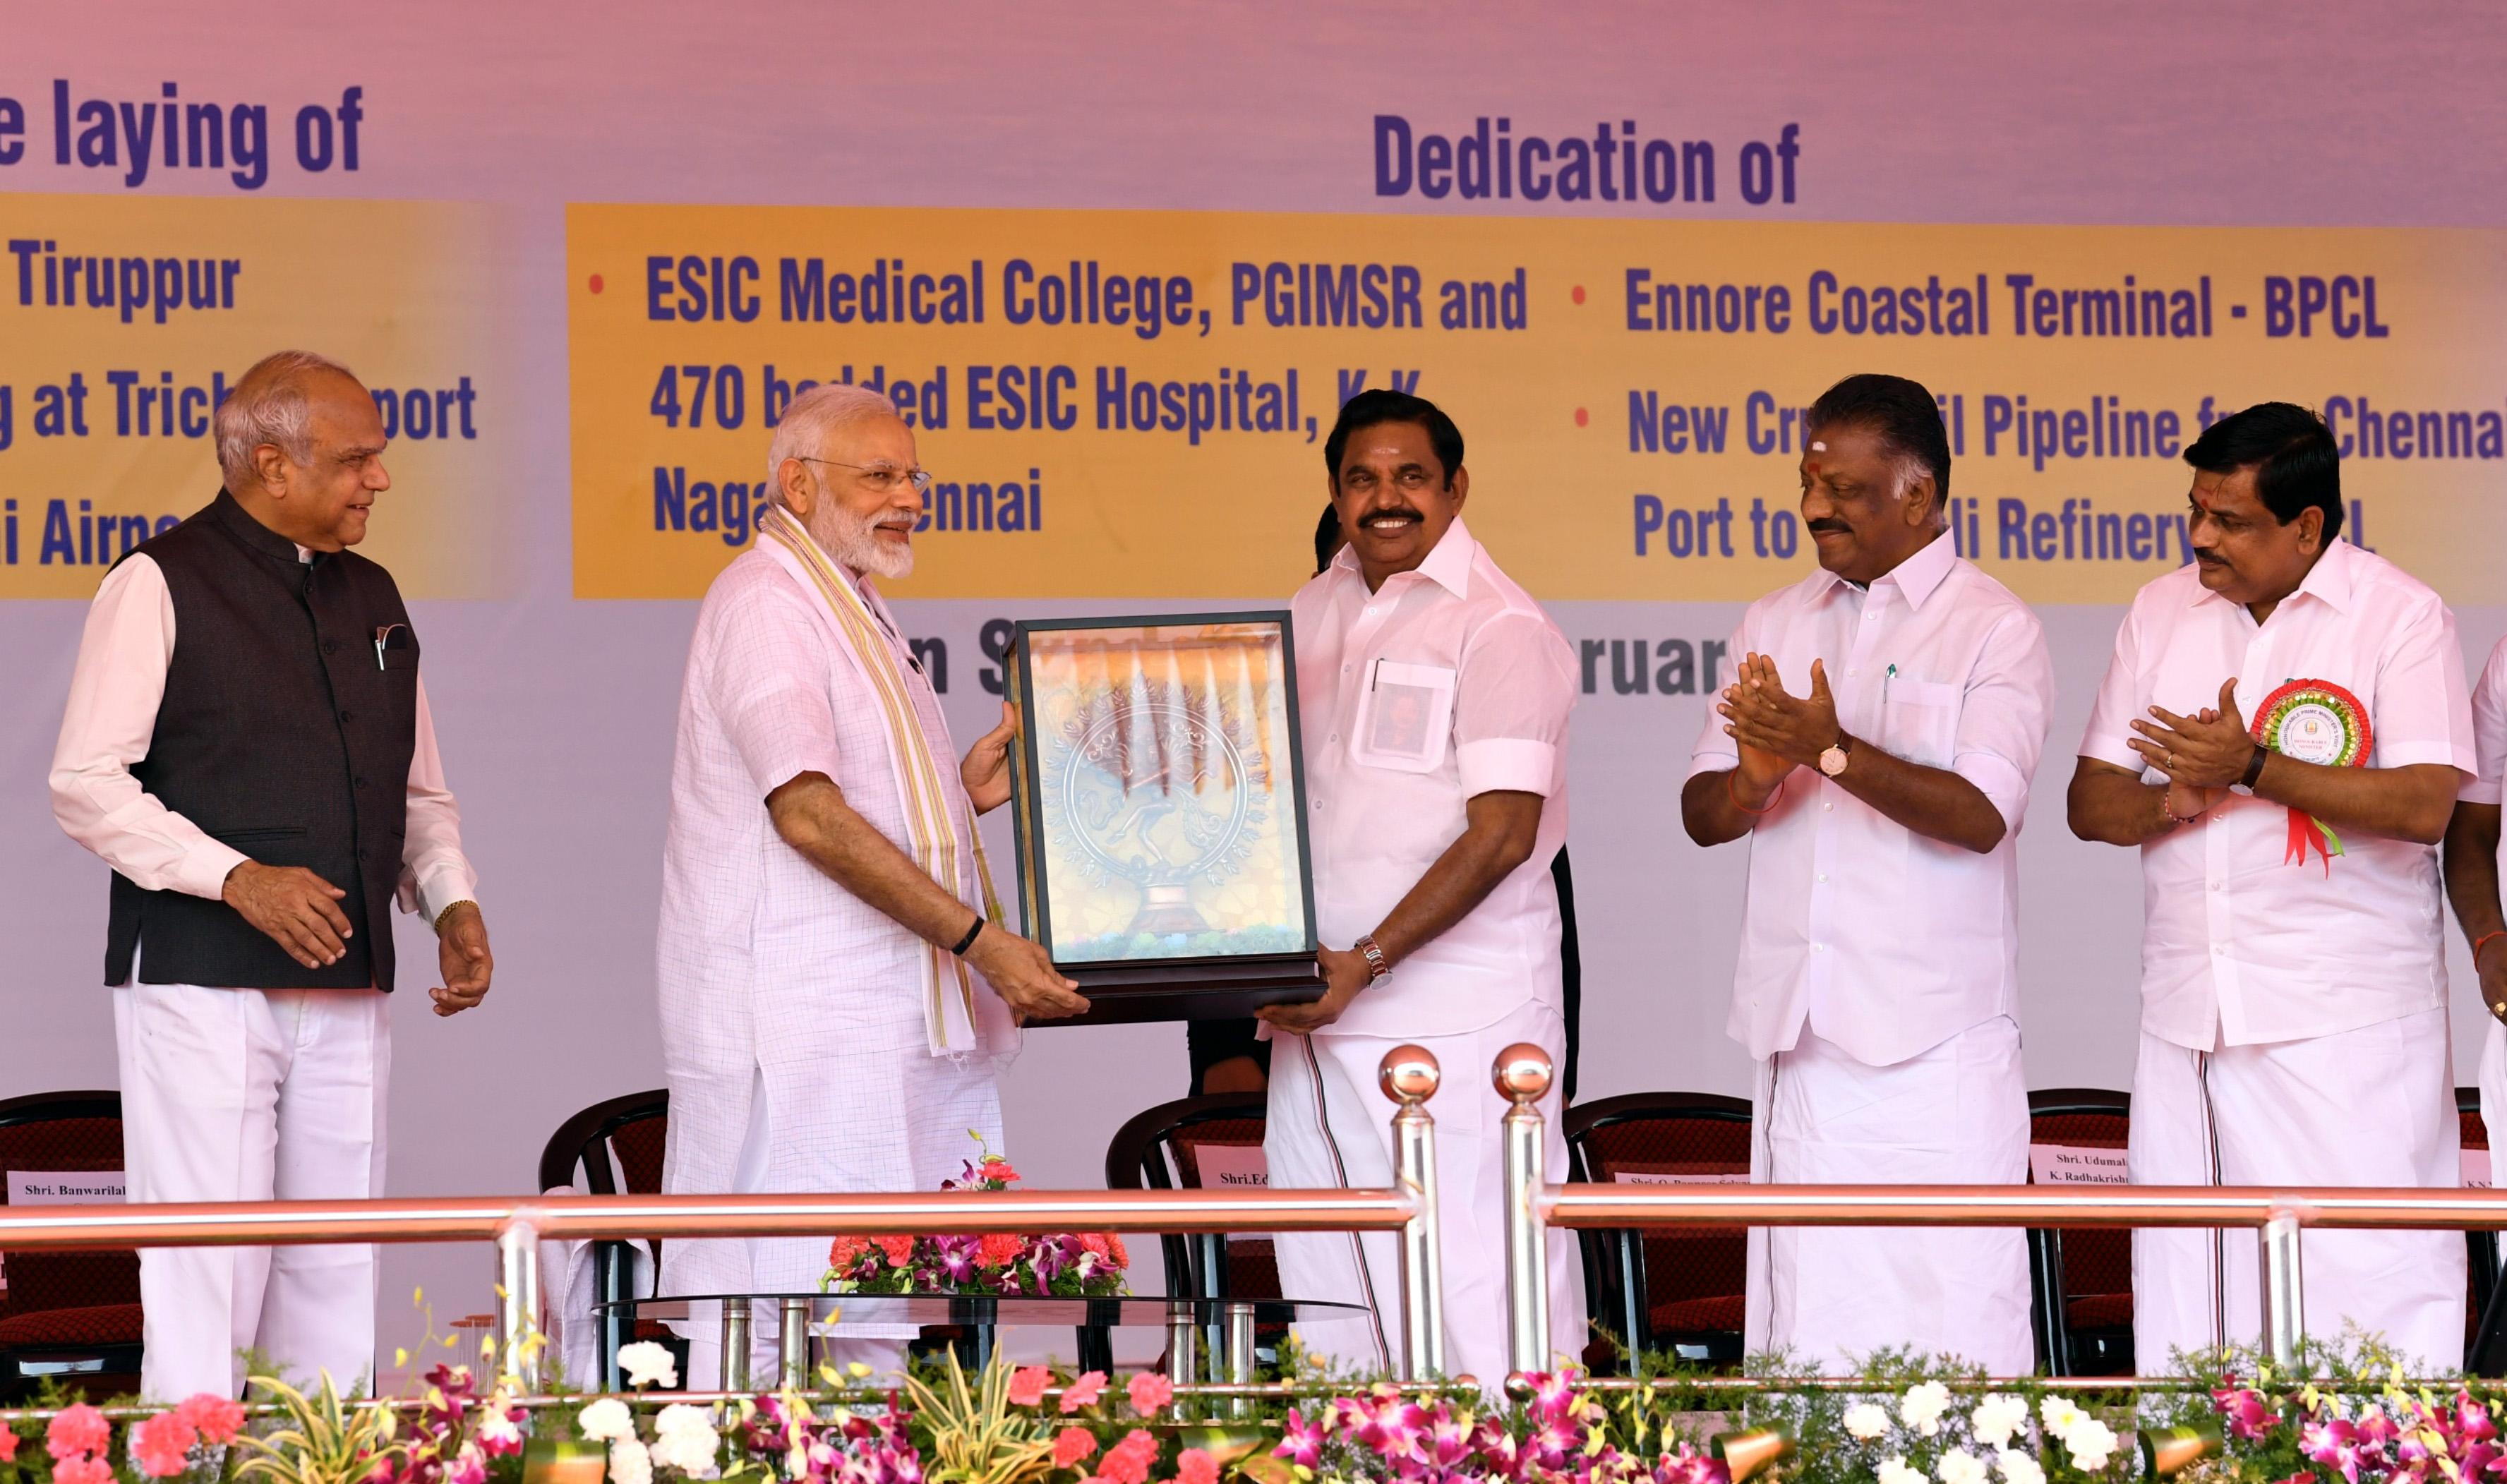 PM visits Tiruppur, Tamil Nadu